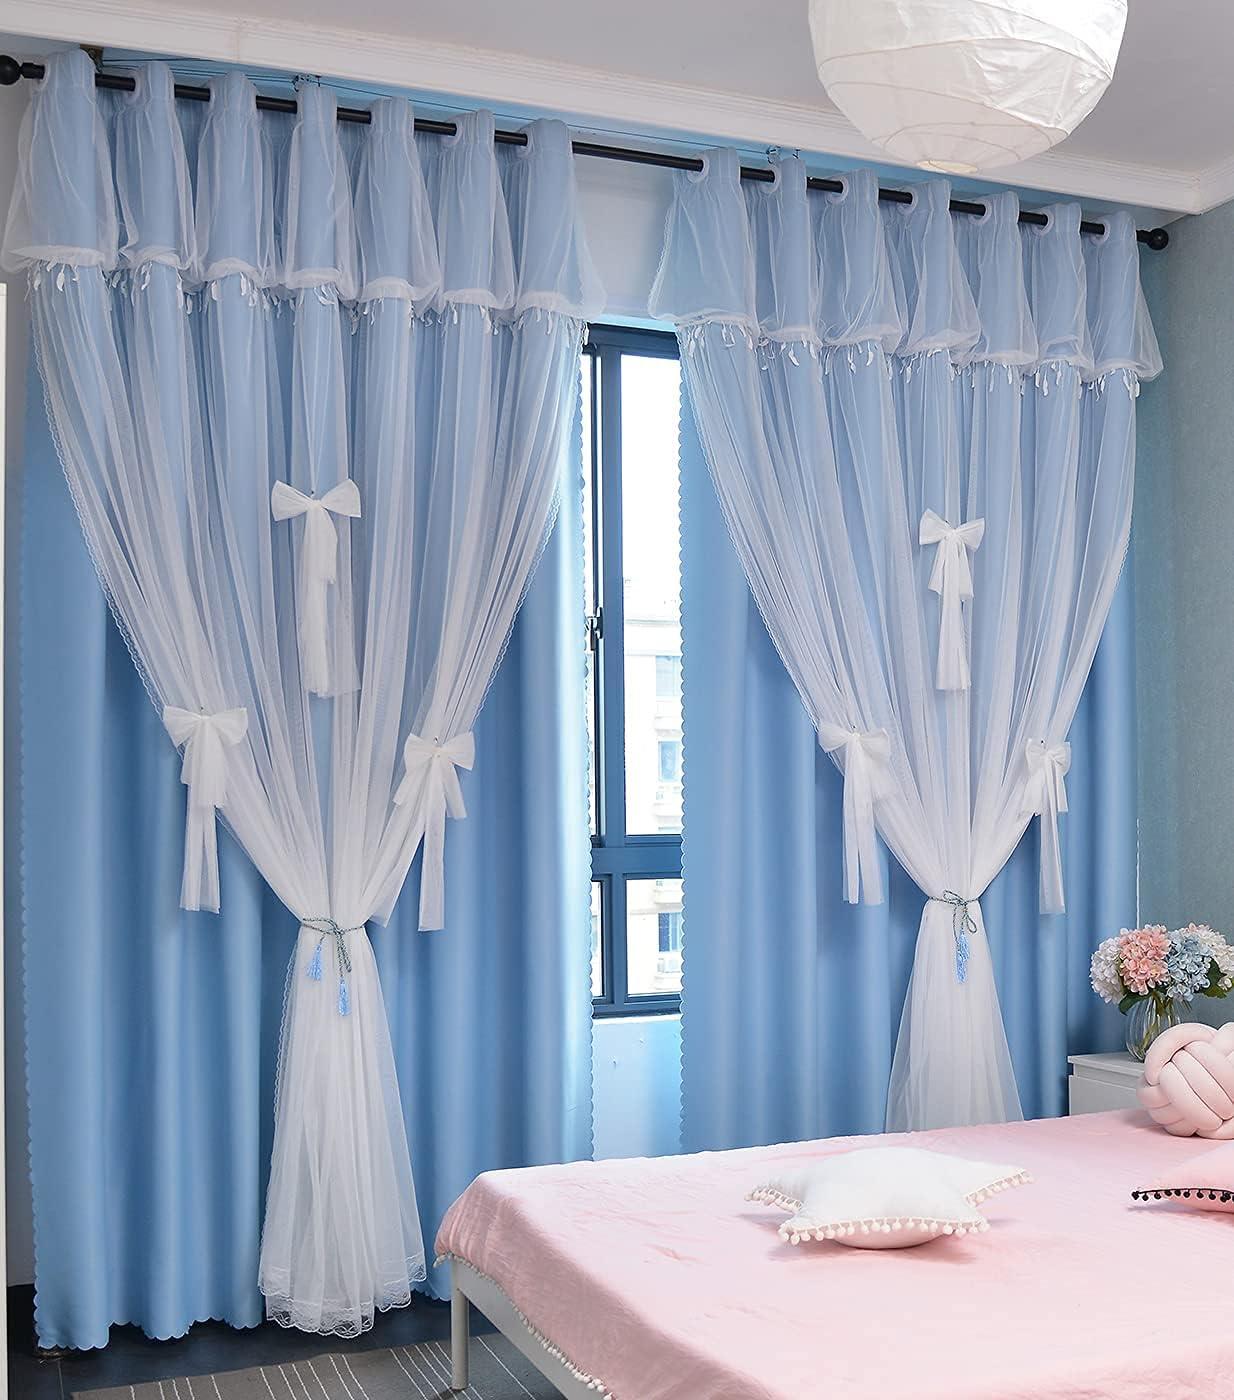 Yancorp Room Darkening Curtains for Nursery Girls Kids Bedroom B